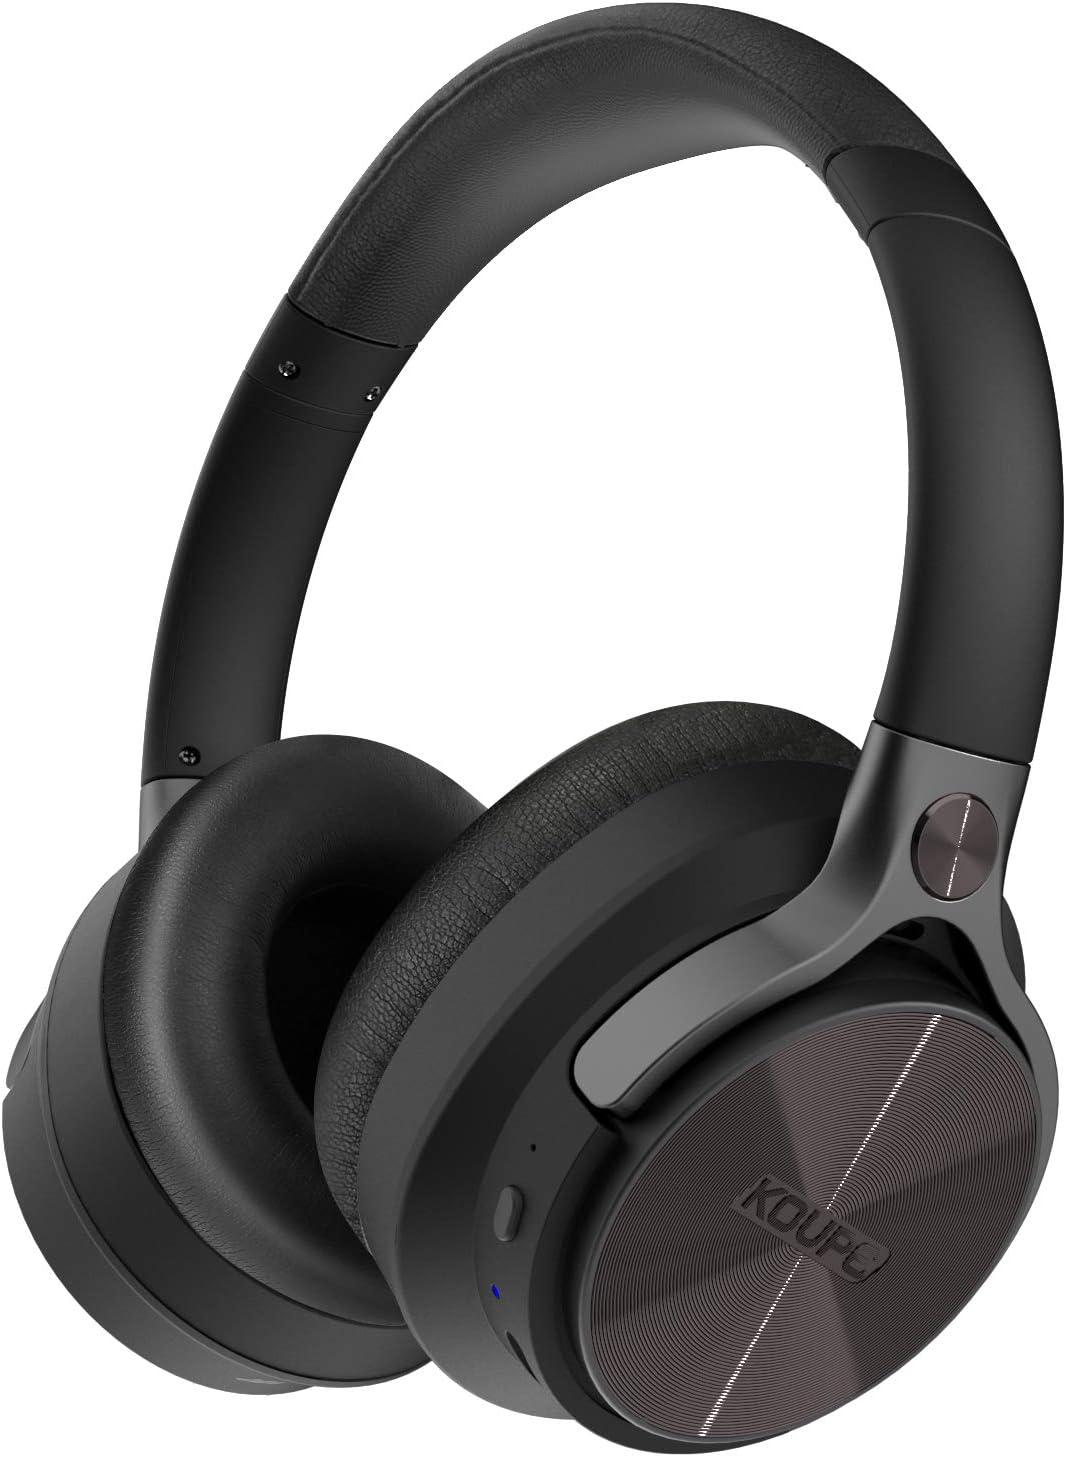 Active Noise Cancelling Bluetooth Headphones, Koupe Mardi Gras ANC Headset Over Ear Crisp Powerful Deep Bass Sound, Music Uninterrupted with Soft Ear Cushions Adjustable Headband Swiveling Earcups